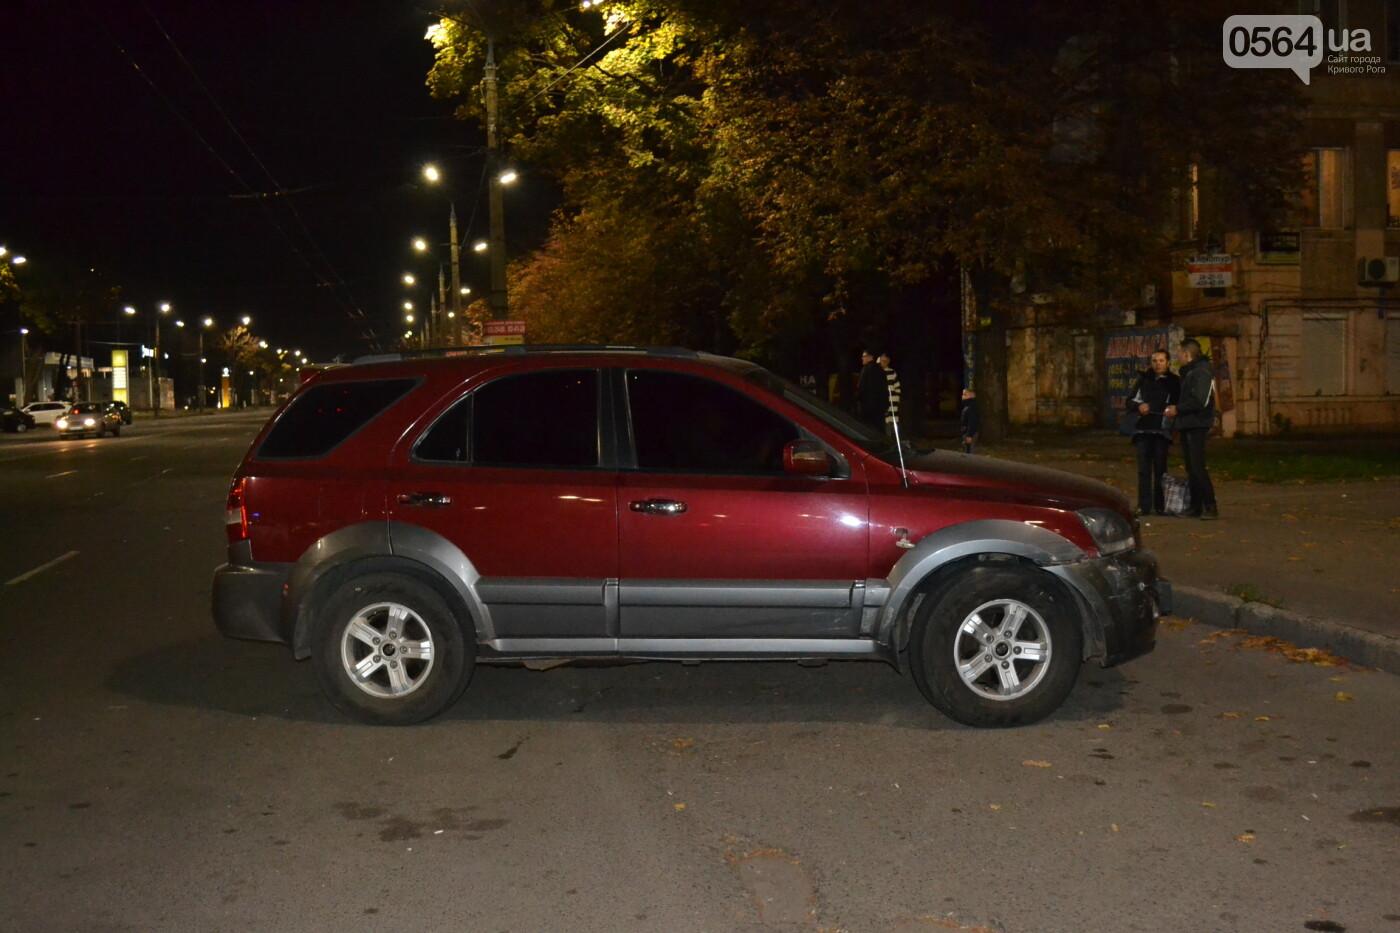 На проспекте Мира в Кривом Роге столкнулись Lanos и Kia, - ФОТО, ВИДЕО, фото-17